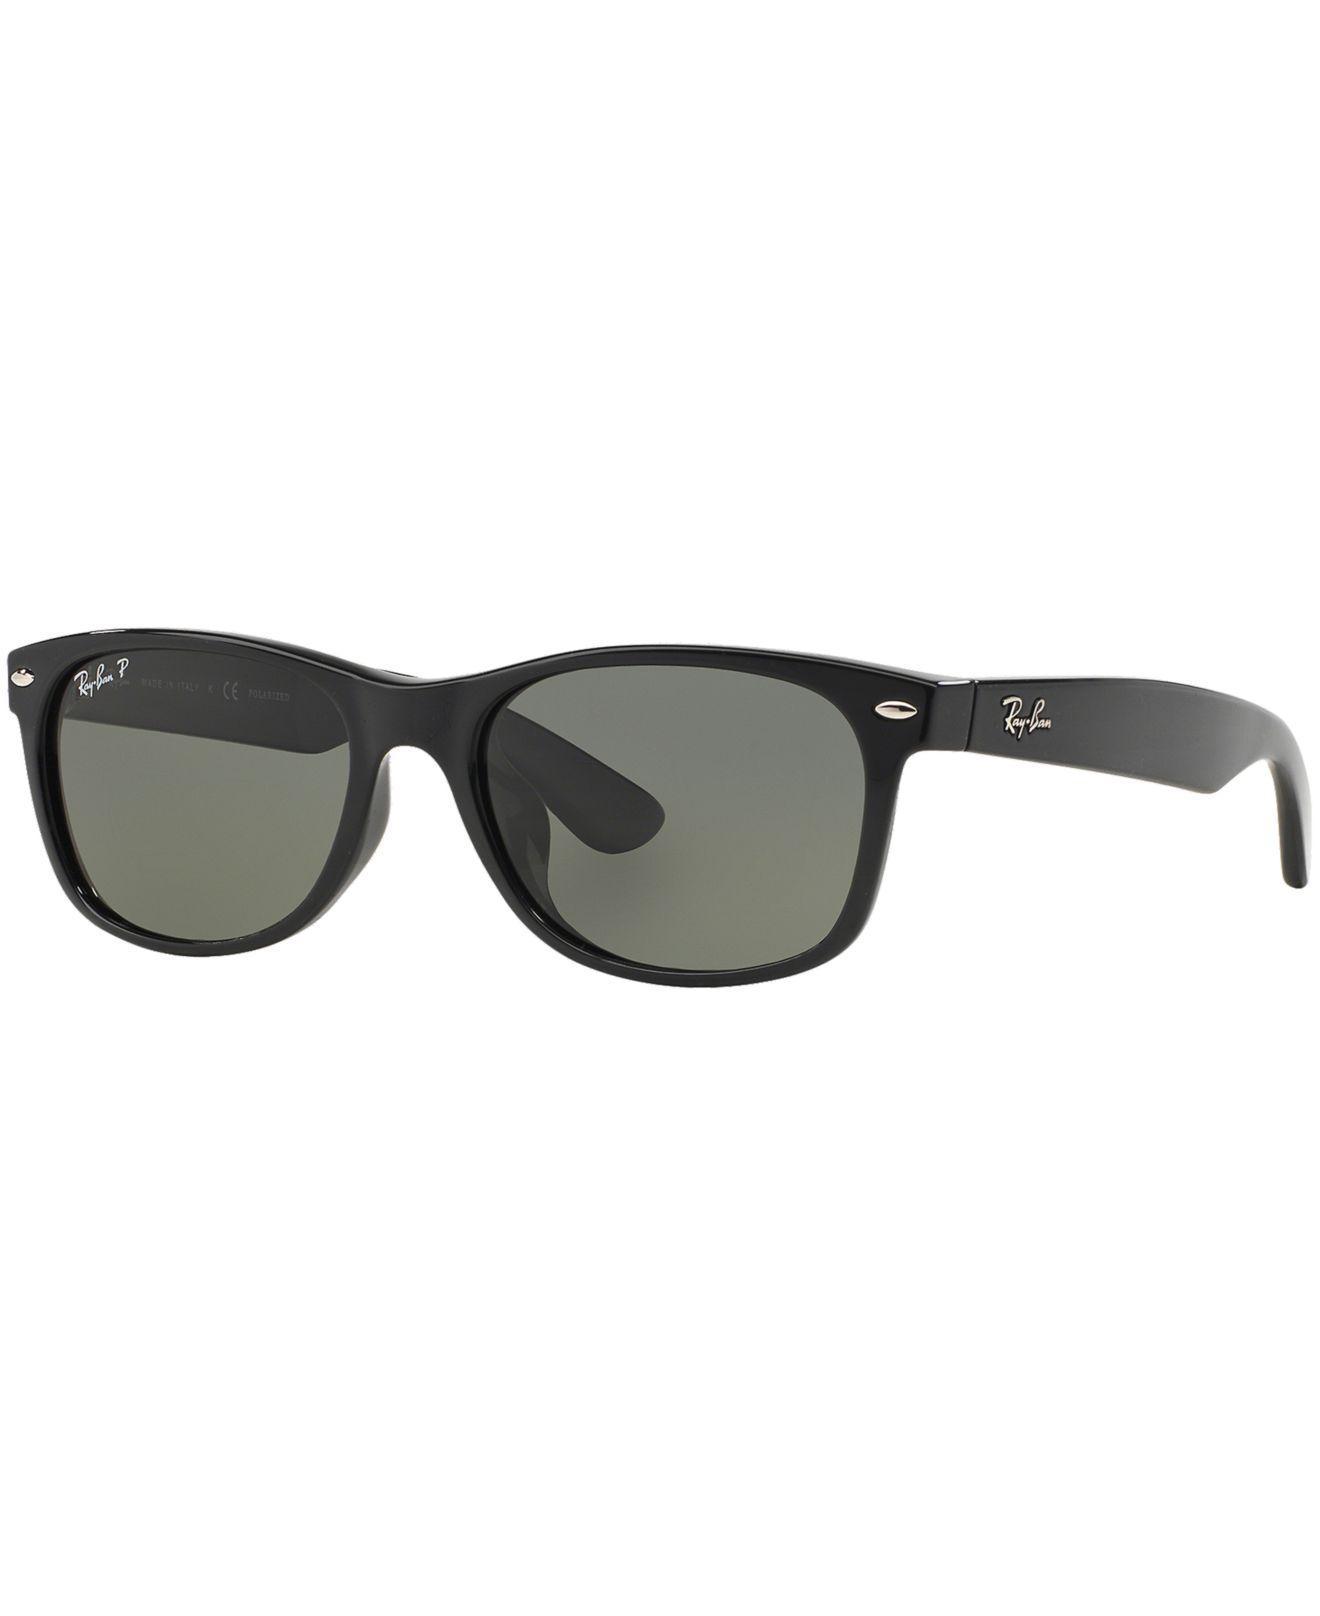 34fe0167e4 Ray-Ban. Men s Black Polarized Sunglasses